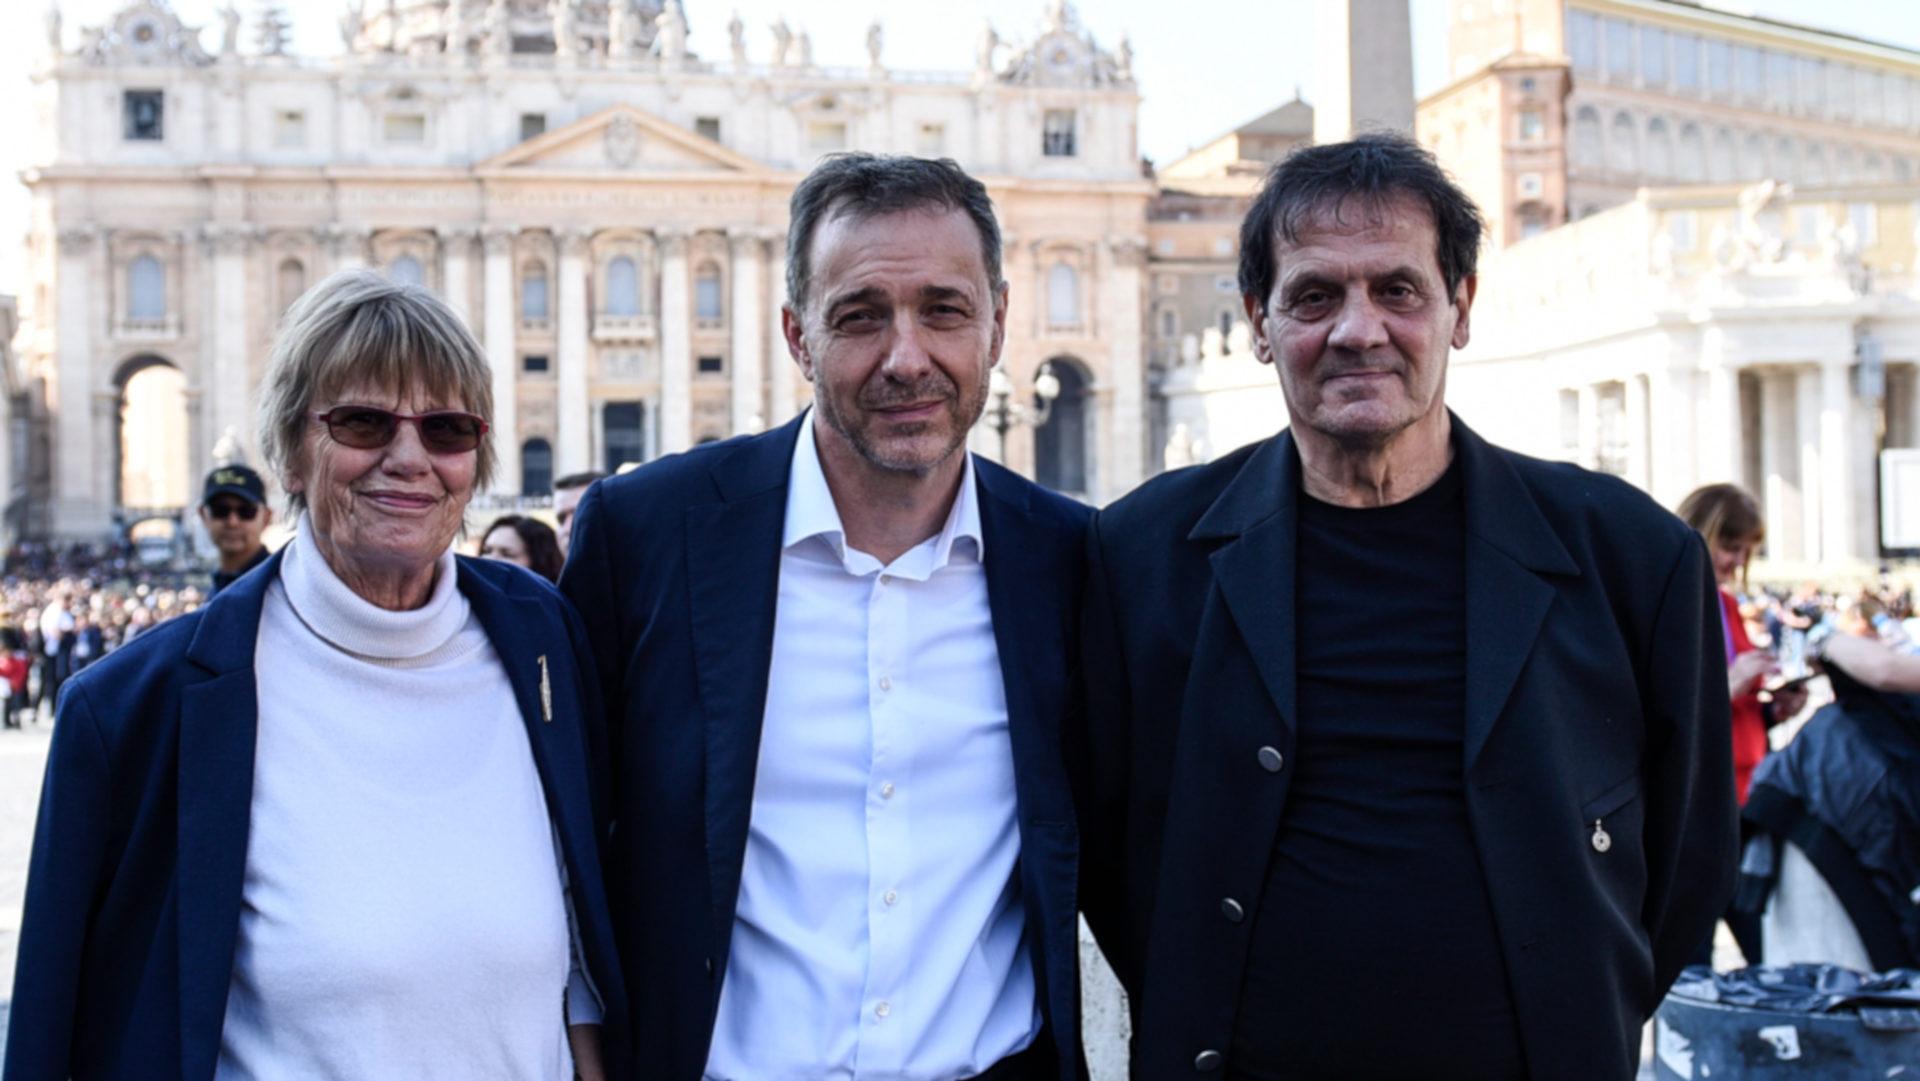 A.W., Guido Fluri, Mario Delfino auf dem Petersplatz | © Marco Bonomo